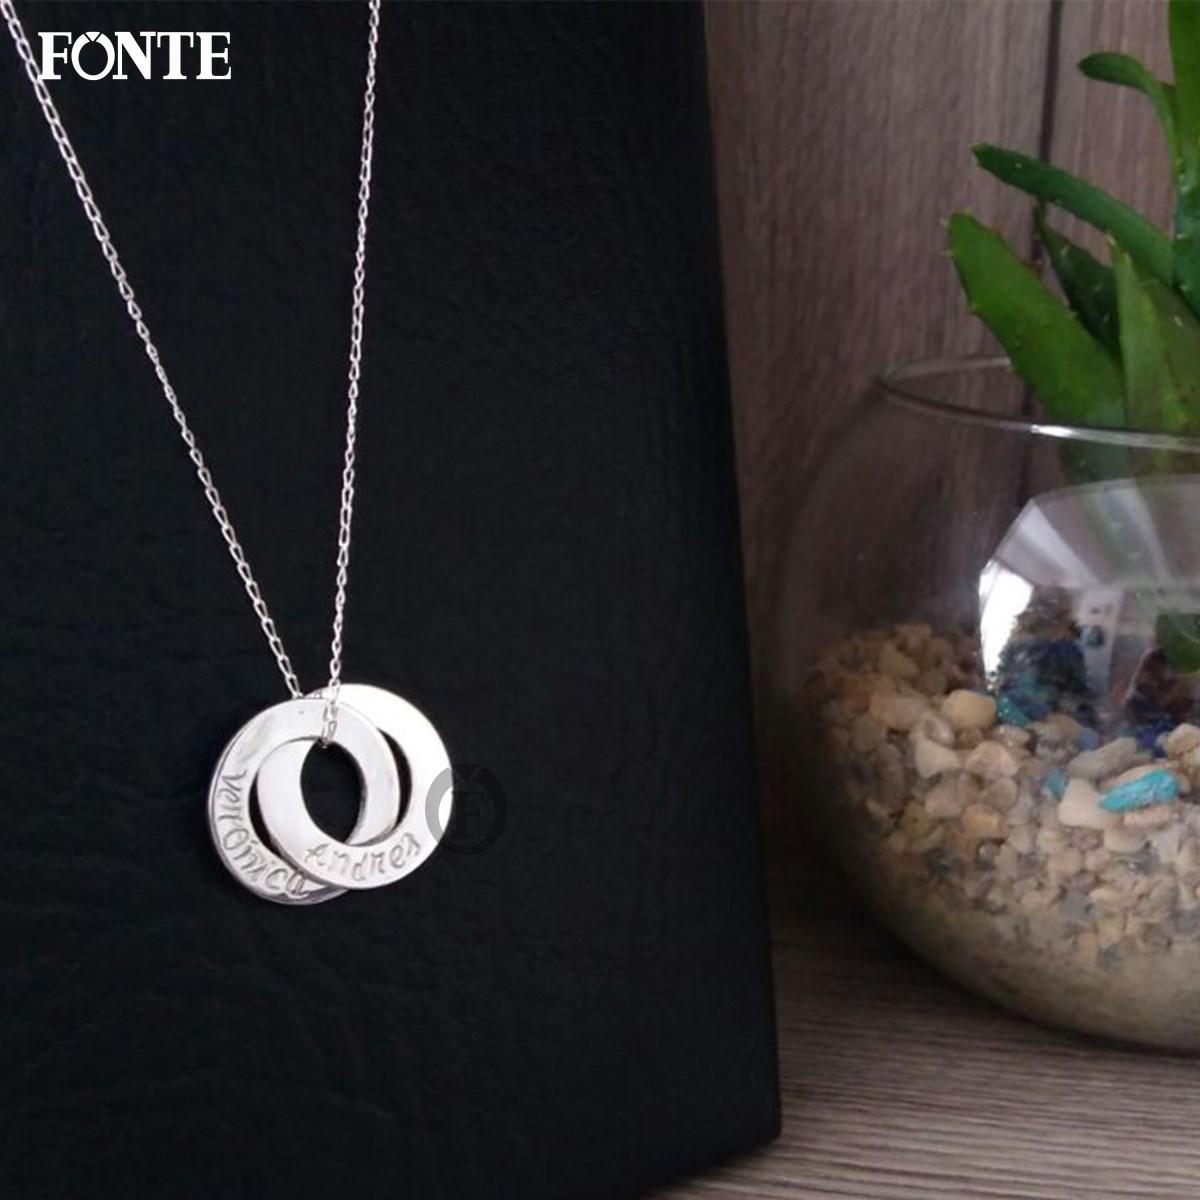 d7cf6efe4d71 En donde comprar dijes joyas personalizadas en Bogota Medellin Cartagena  Bucaramanga Cali Colombia Plata Nombres Frases